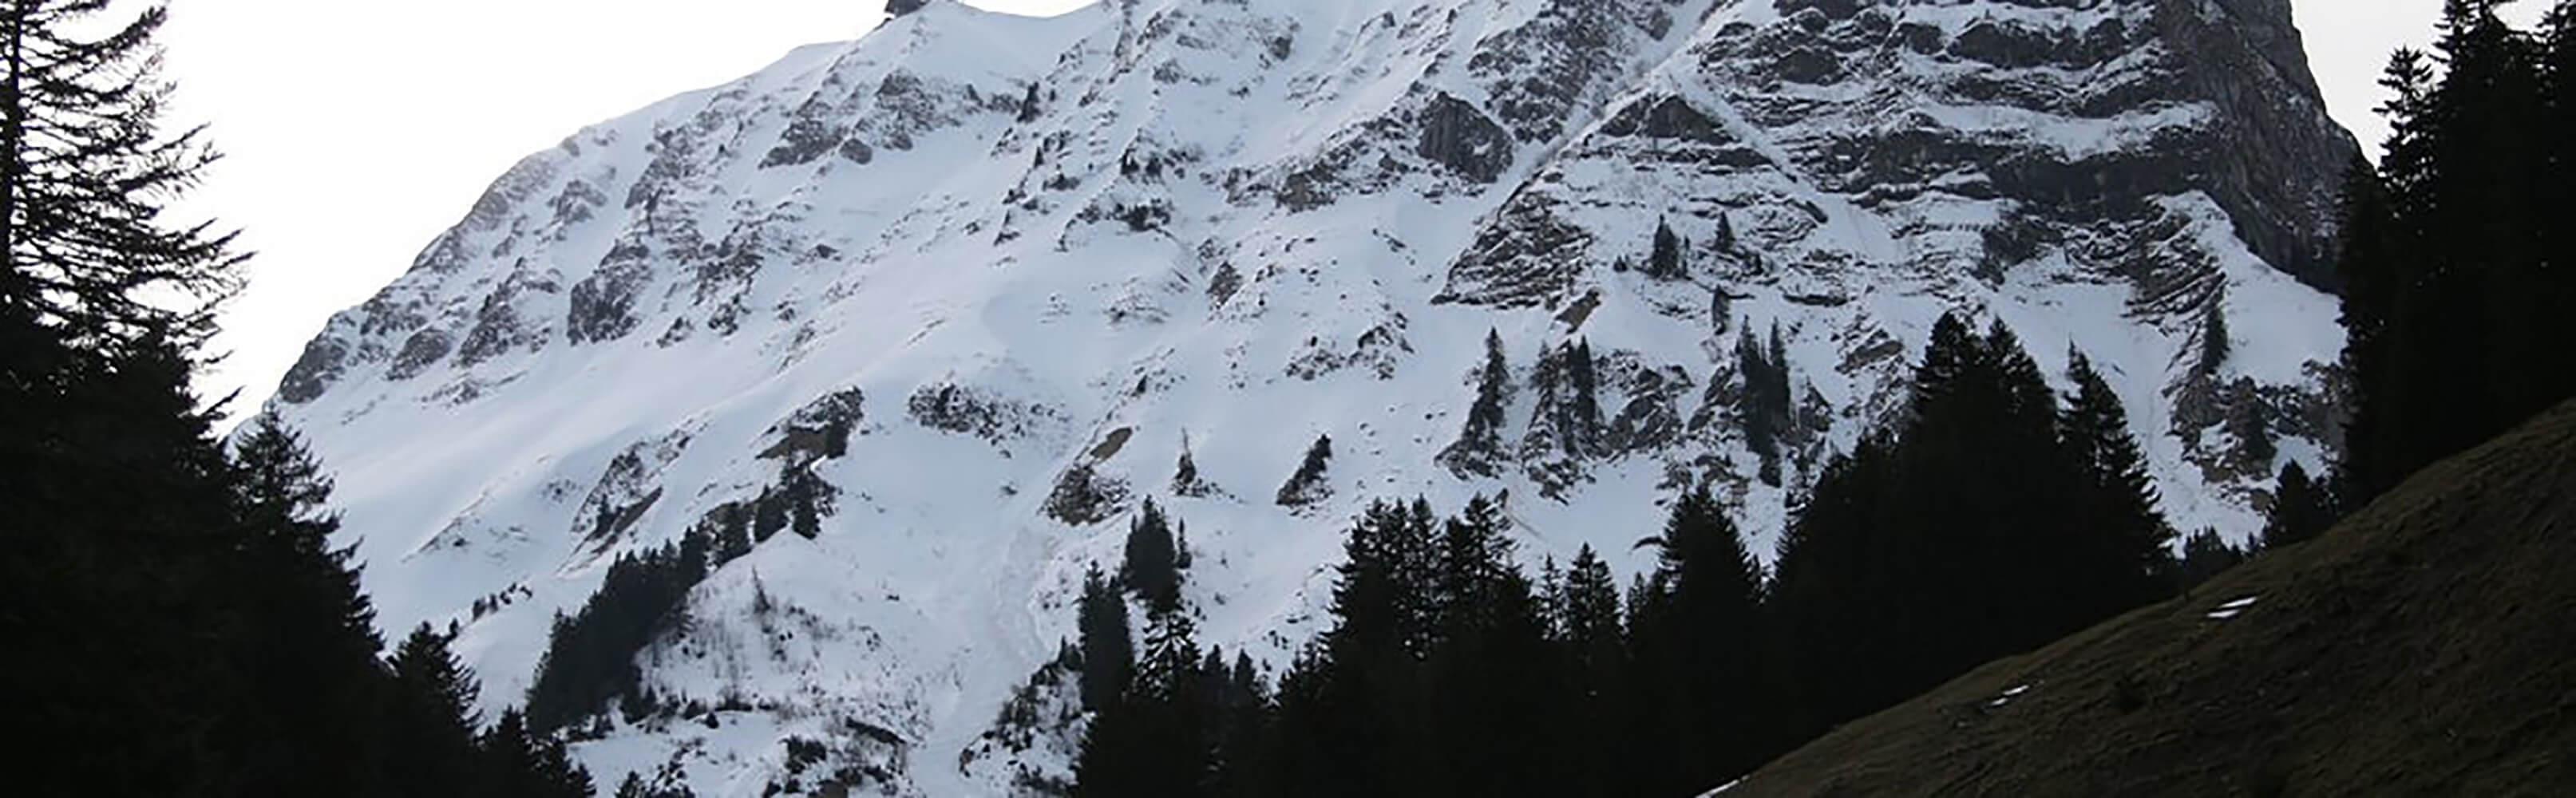 Aussichtsplattform Moléson, Moléson-sur-Gruyères 1